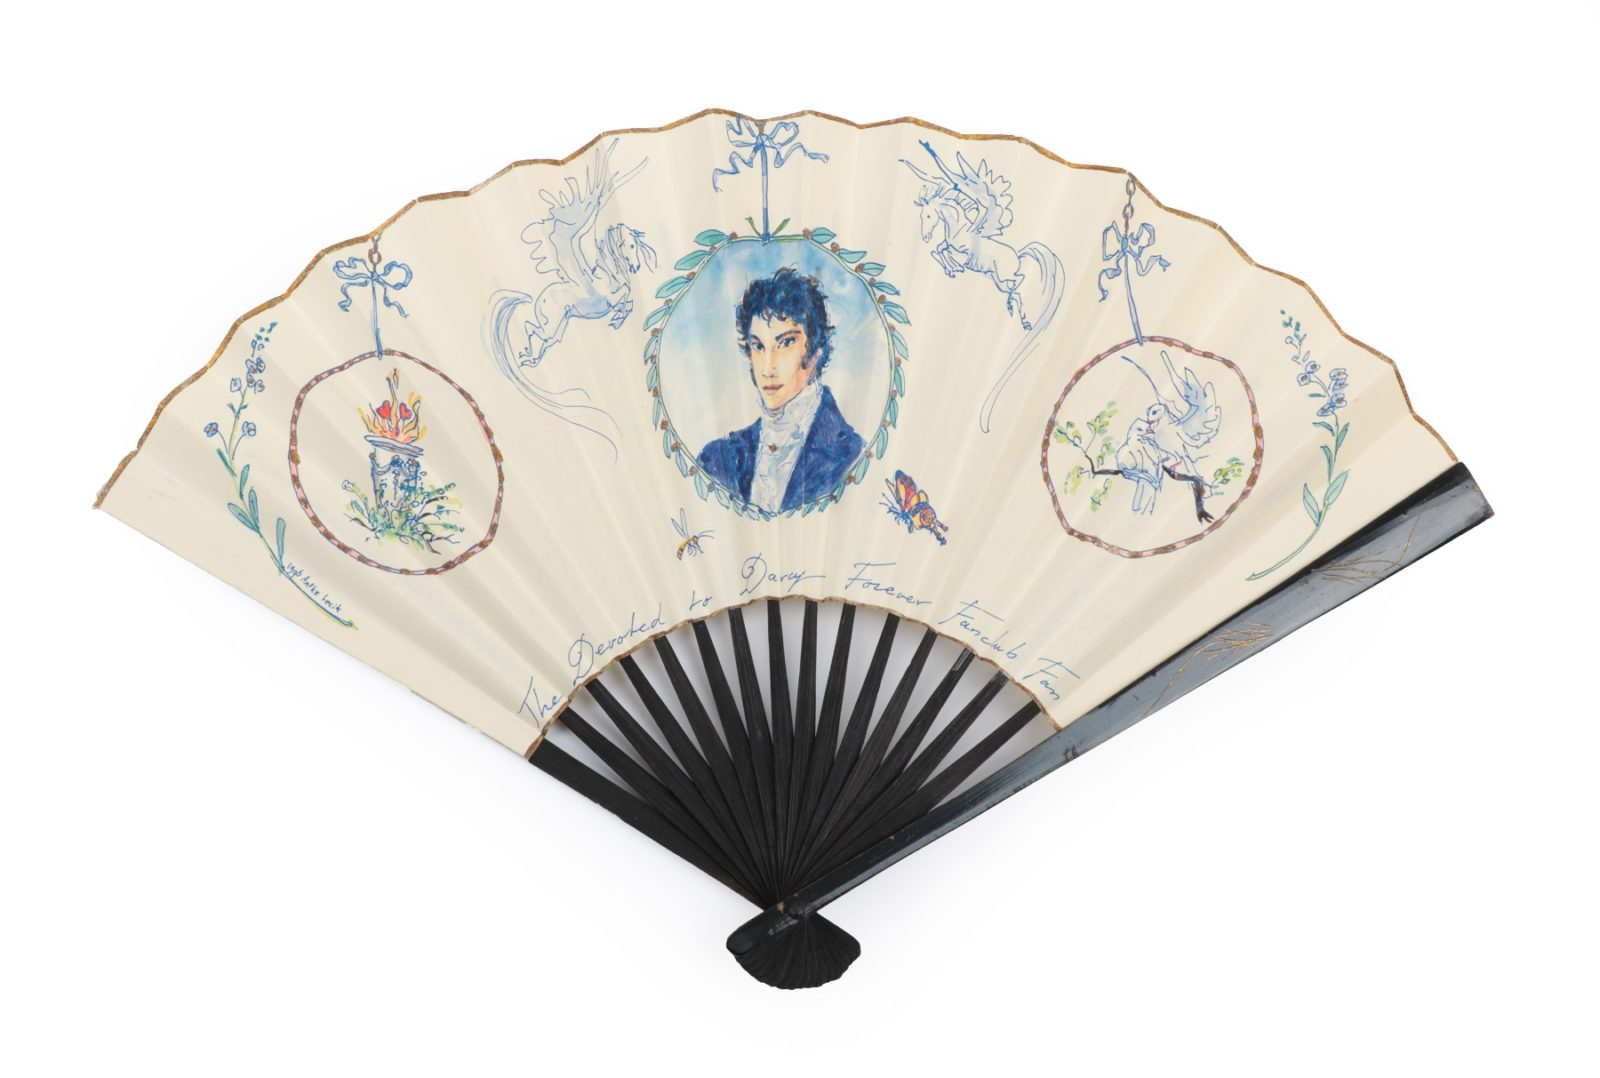 The Mr Darcy Forever Fanclub Fan